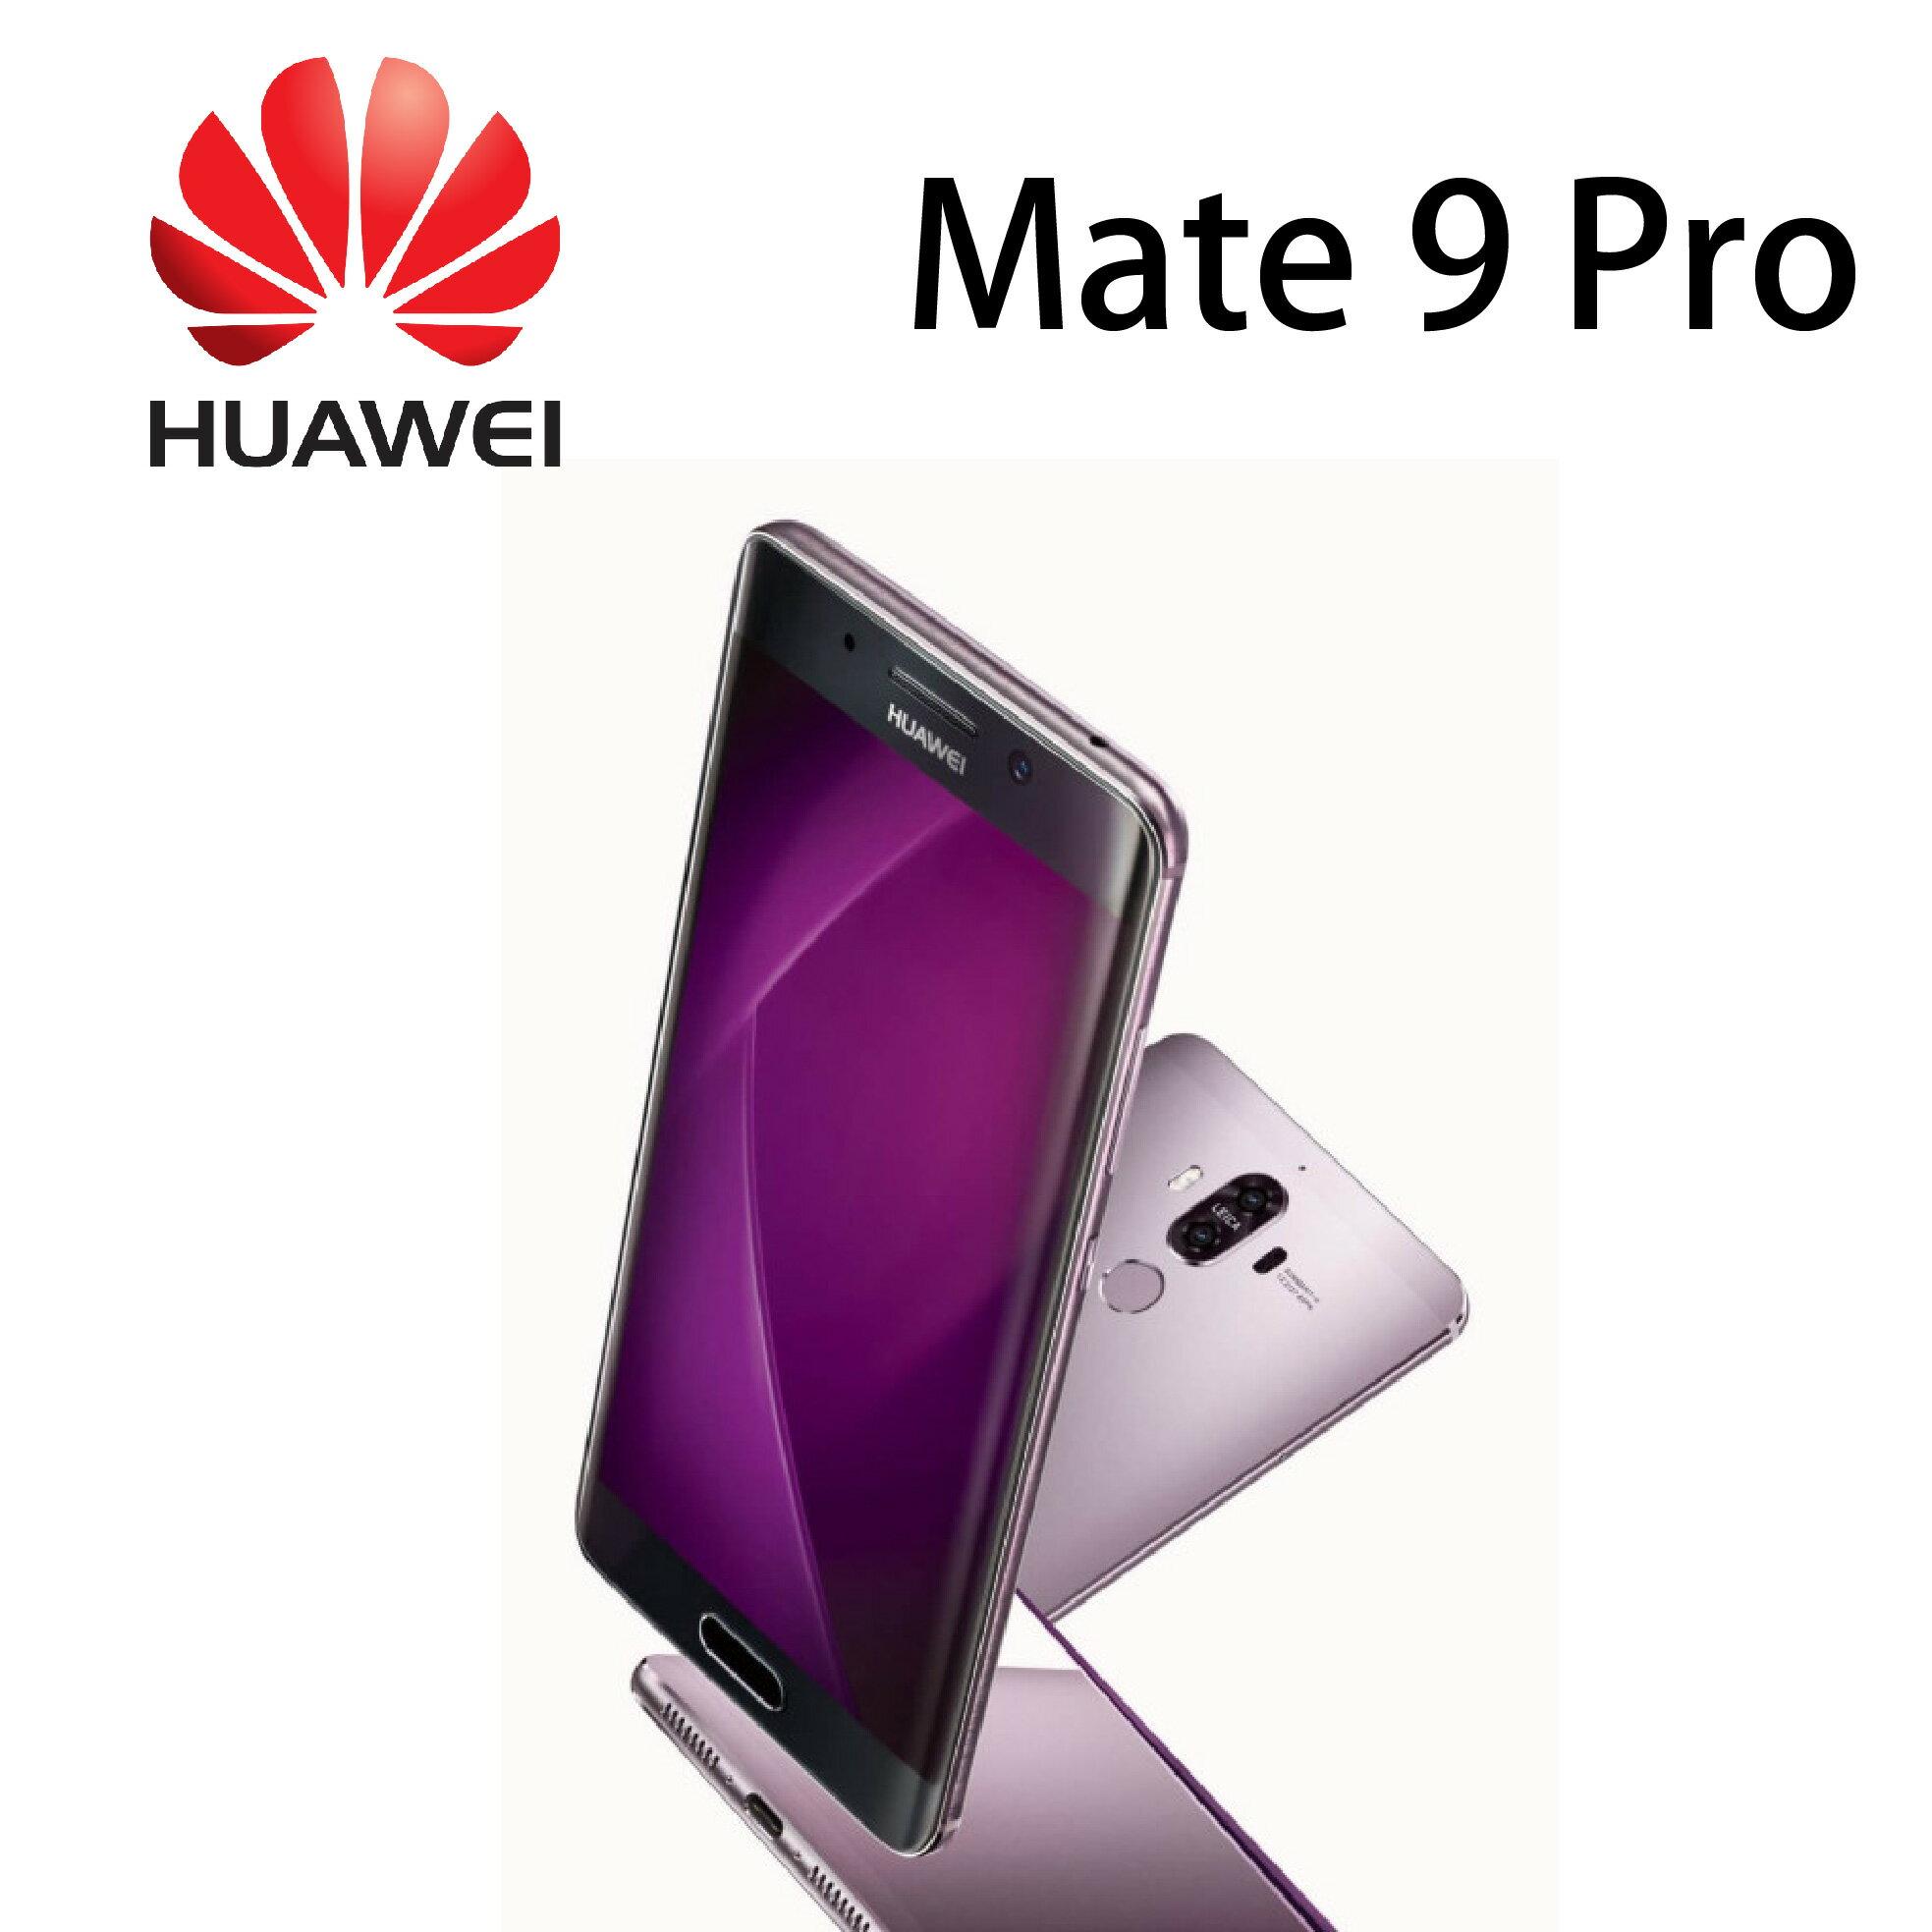 HUAWEI華為 Mate 9 Pro 6G /128G 雙卡雙待/徠卡雙鏡頭-金《贈原廠自拍三腳架》[